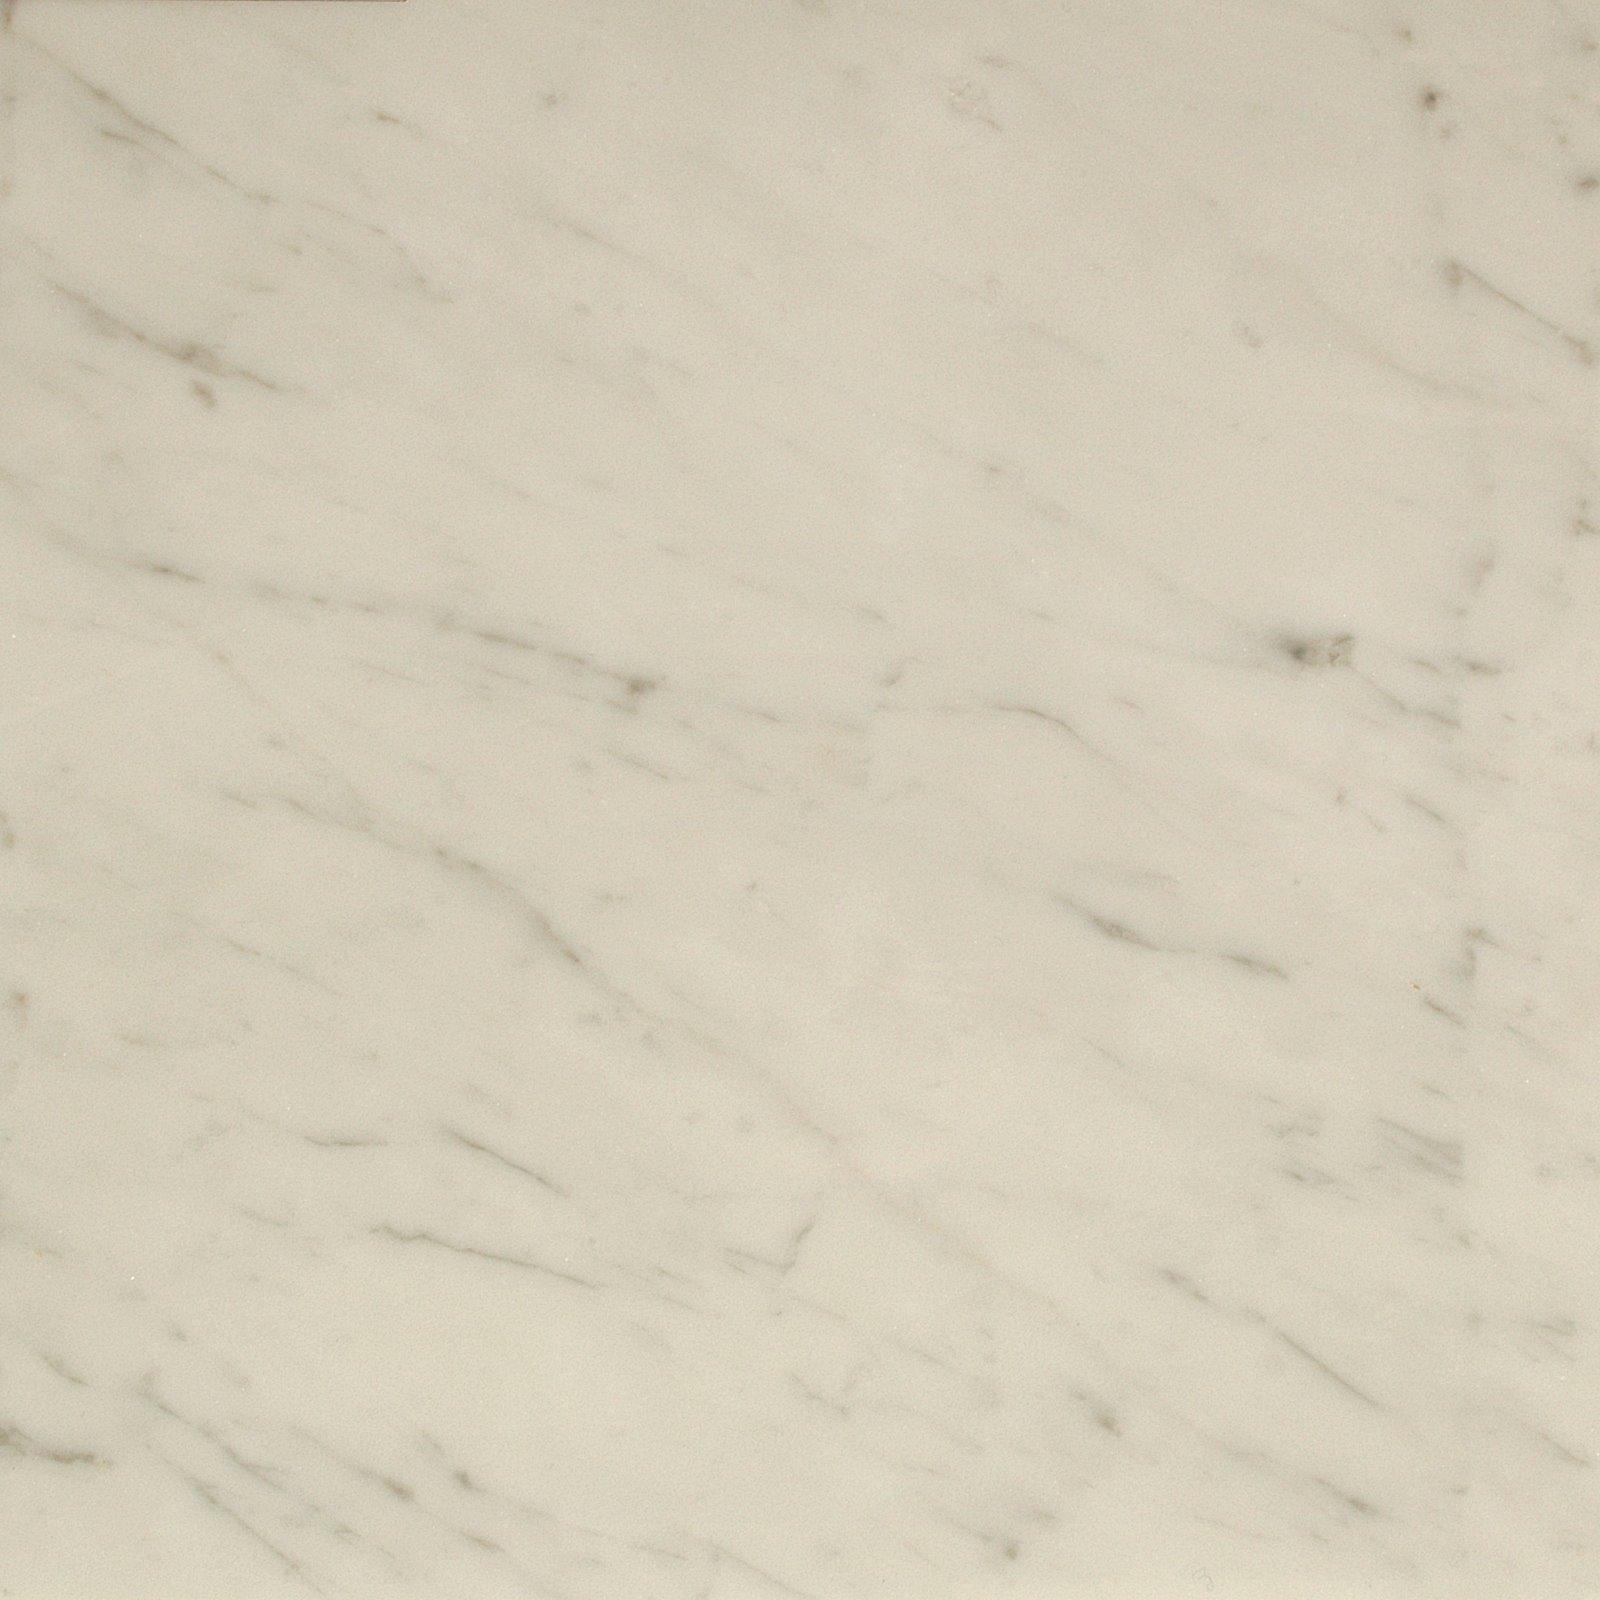 Bianco carrara marble tiles slabs and countertops white Italian carrara white marble countertop